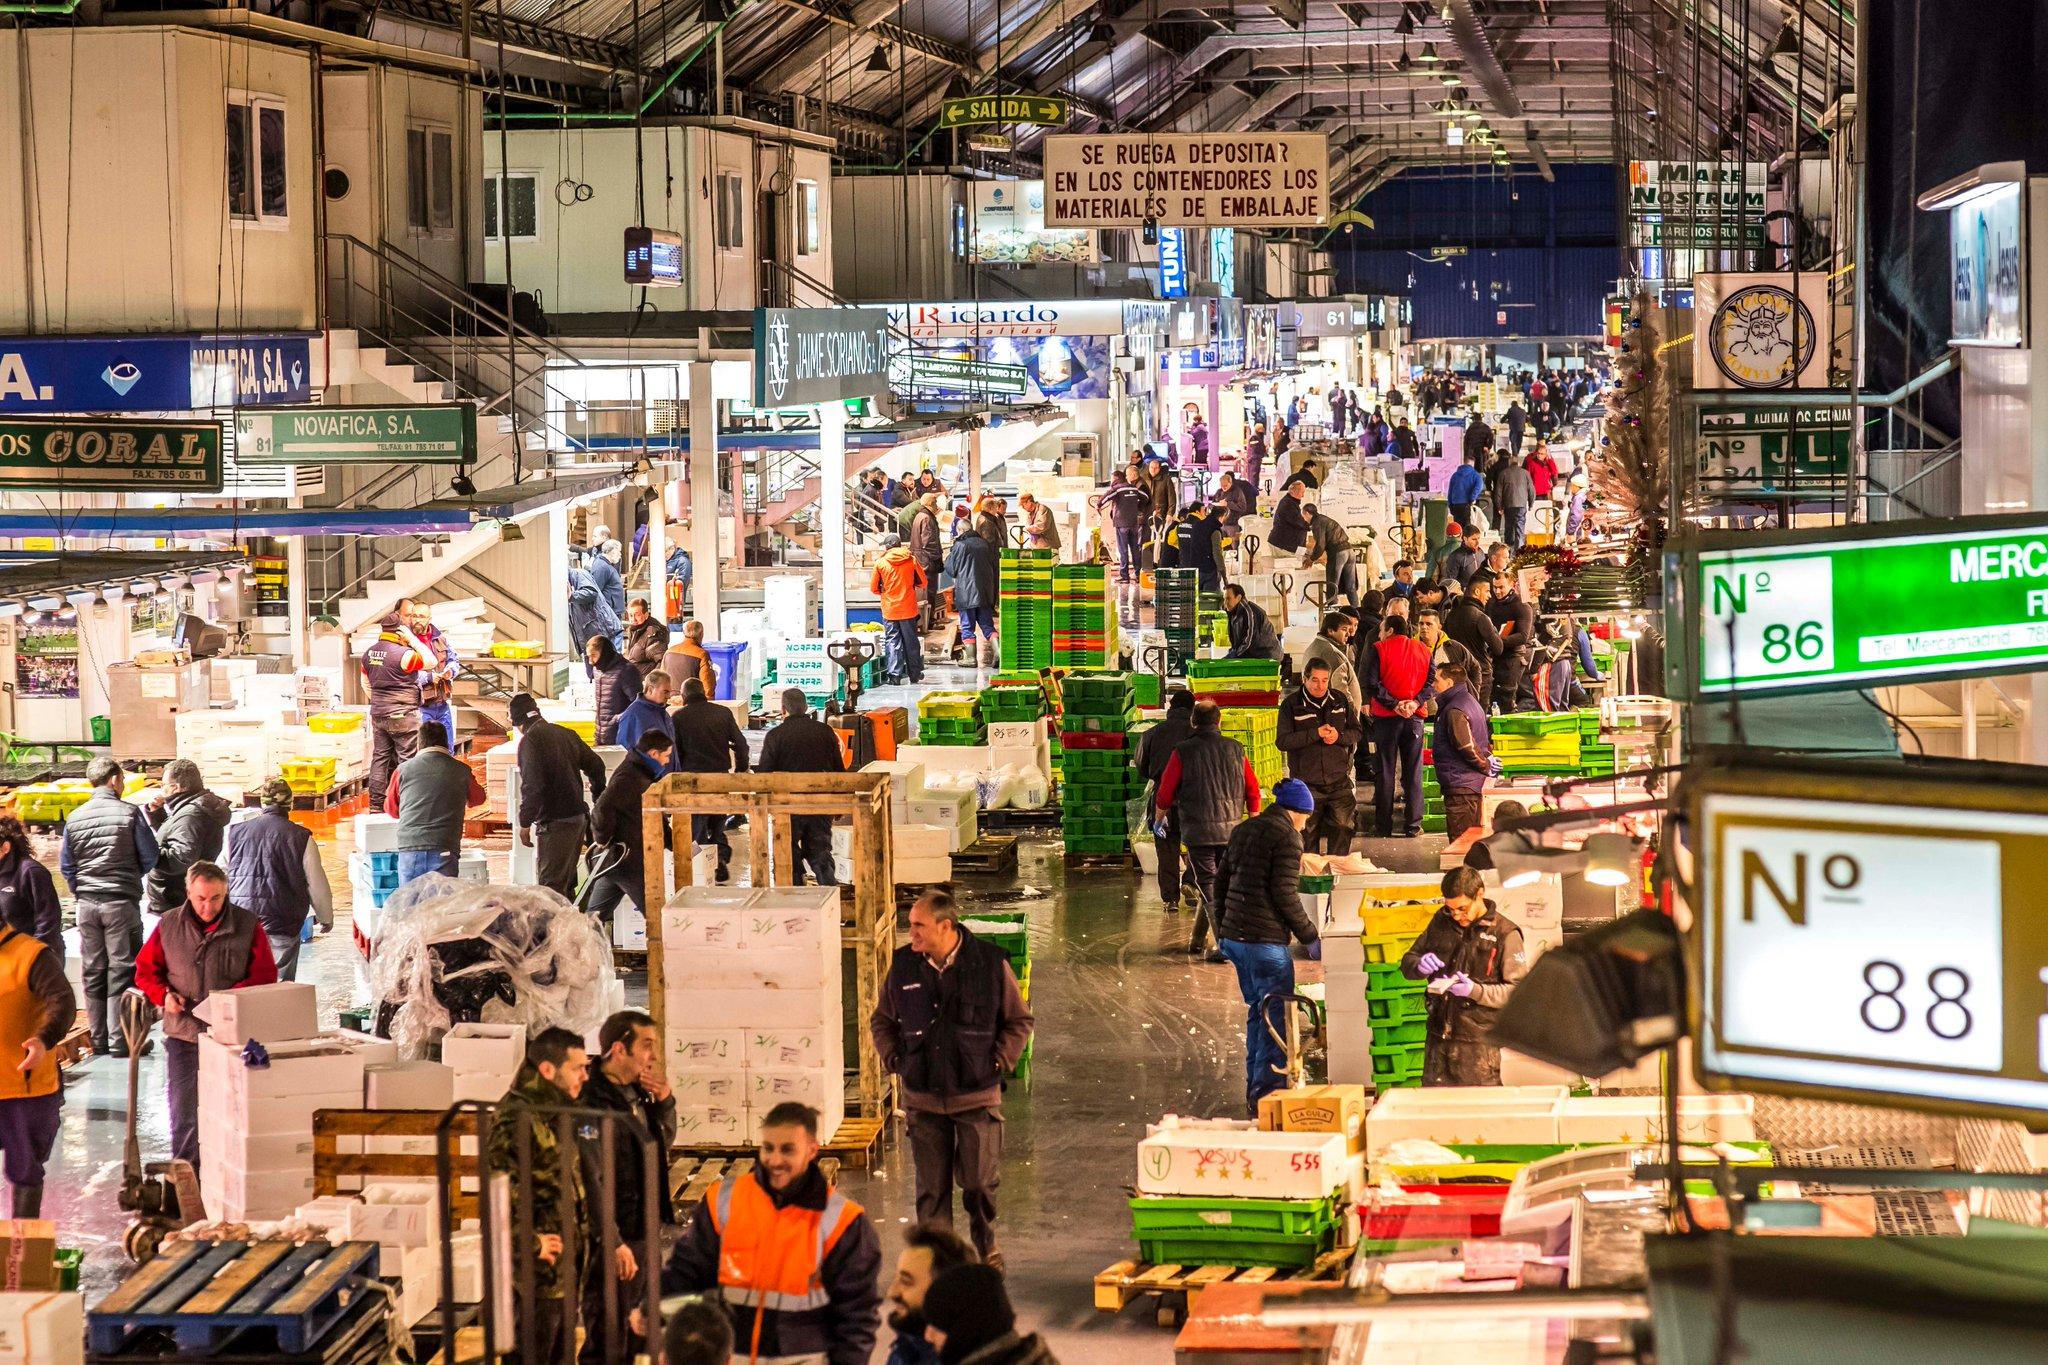 Remodelación Mercado Pescados feb 2018